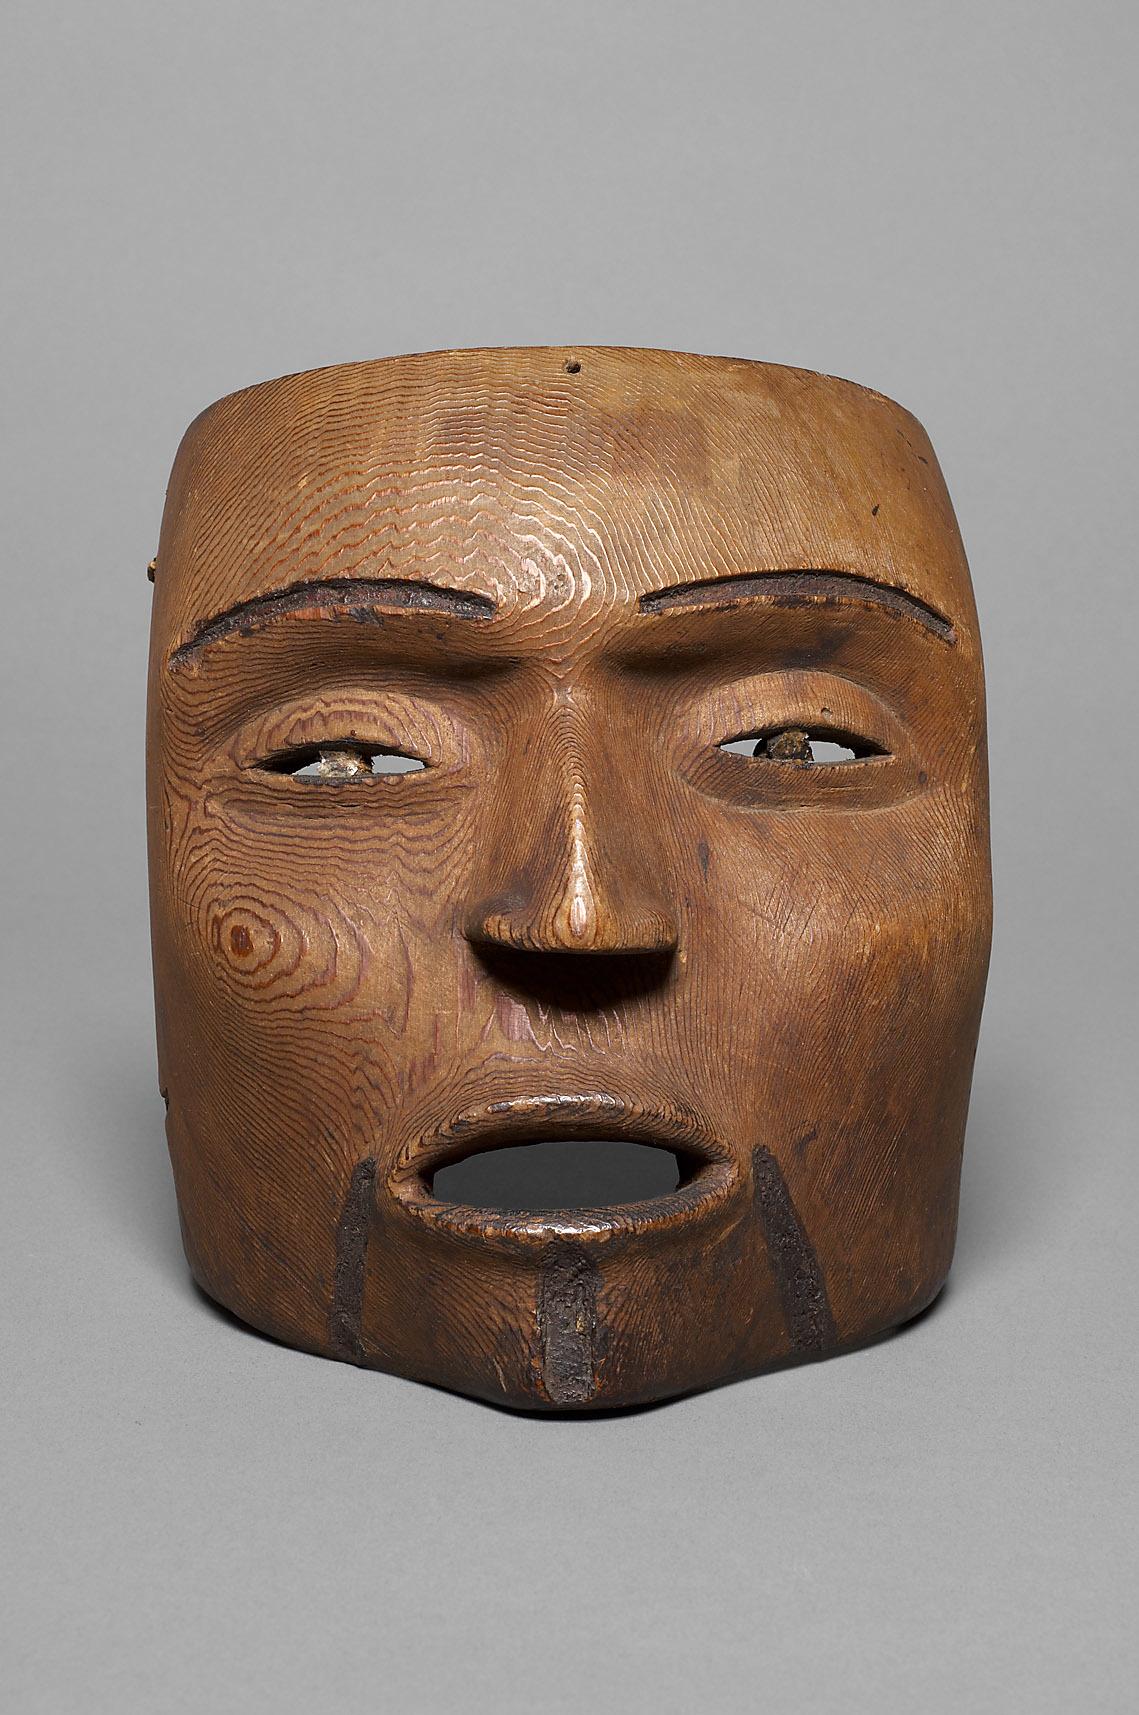 Nootka Mask | Before 1778 © KHM-Museumsverband